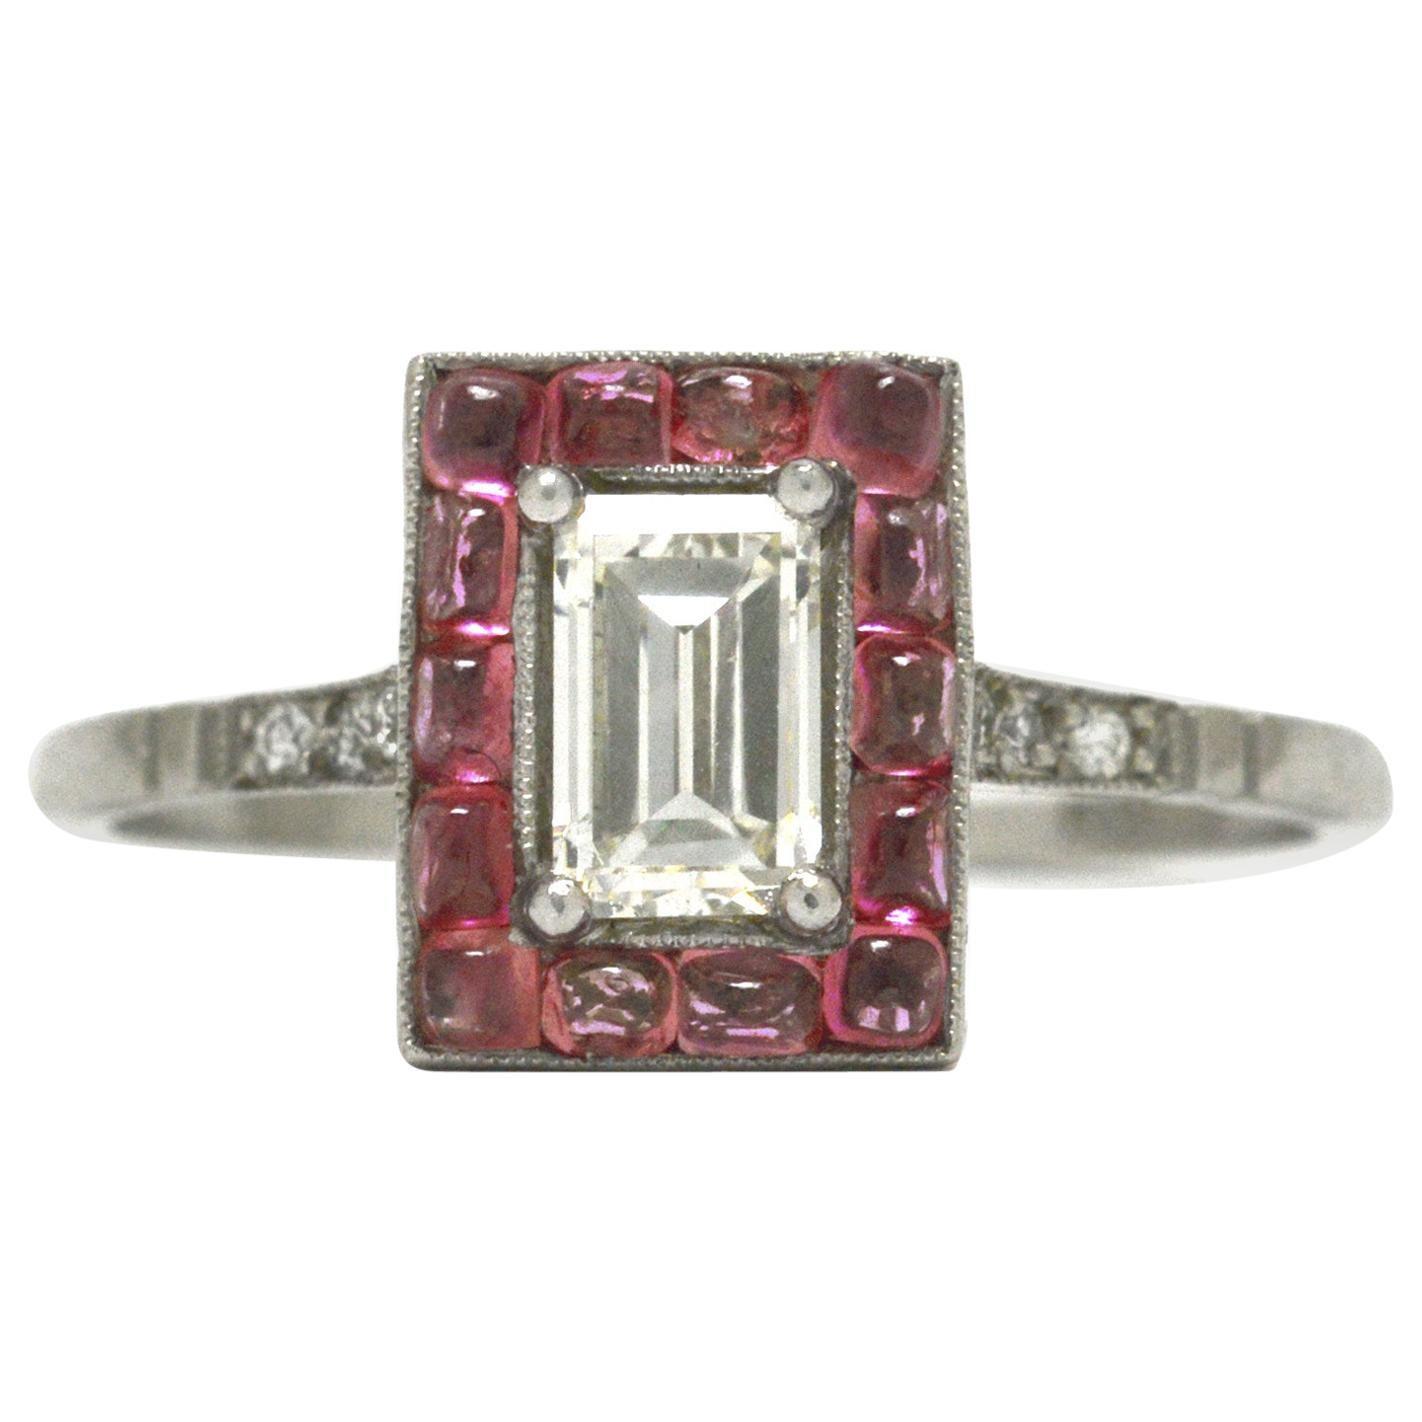 Emerald Cut Diamond Art Deco Style Engagement Ring 3/4 Carat Pink Sapphire Halo